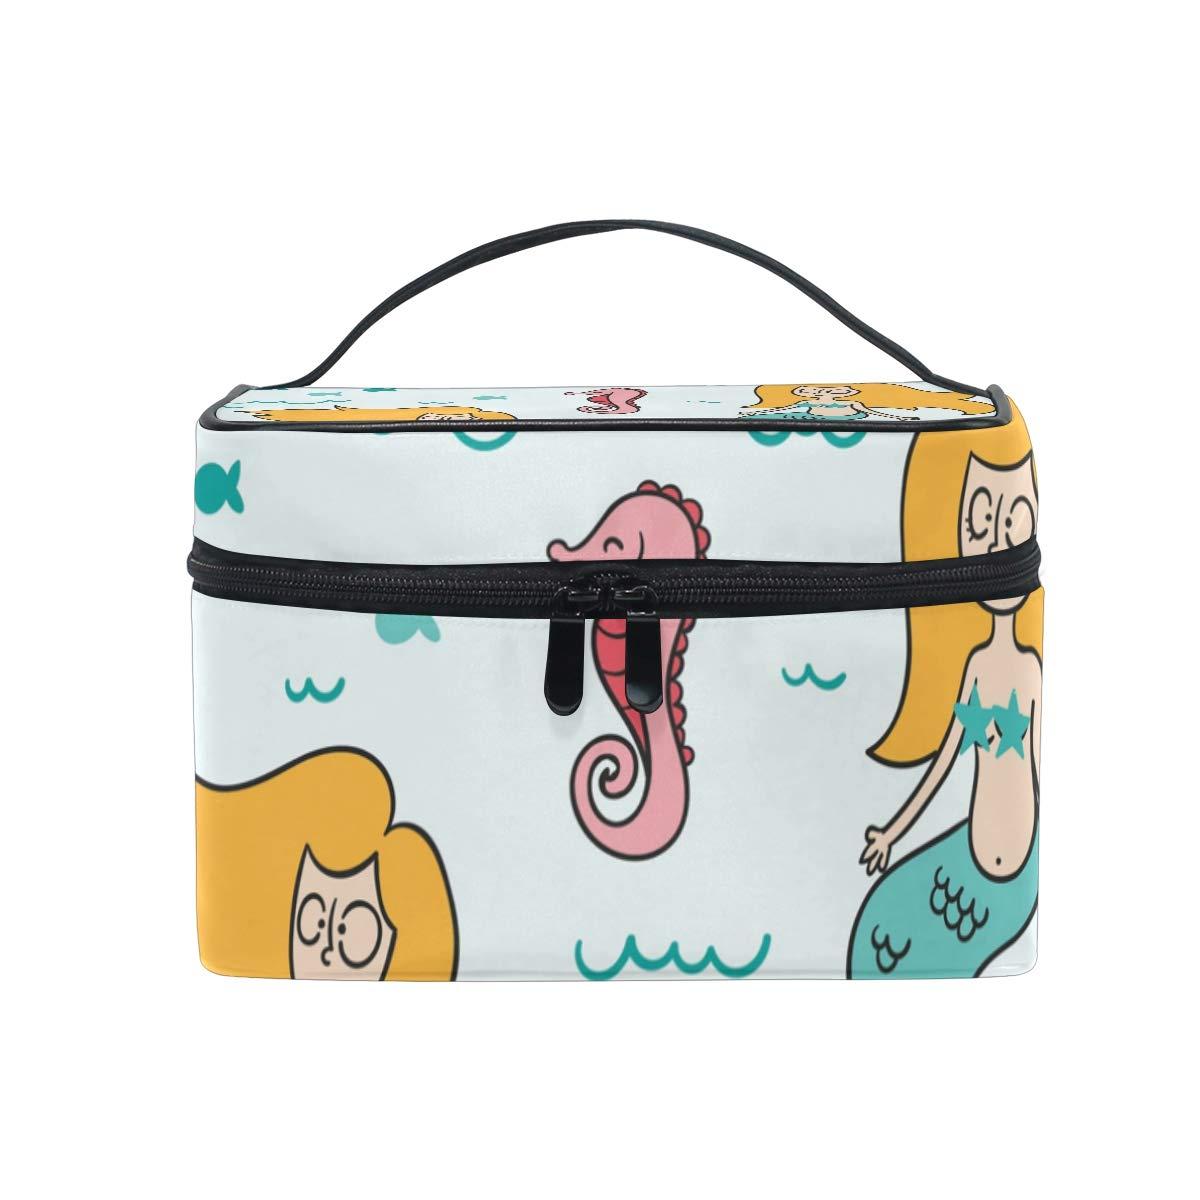 Mermaid Cartoon Funny Makeup Bag Travel Toiletry BOX Portable Organizer Storage Cosmetic Train Case for Women Girls